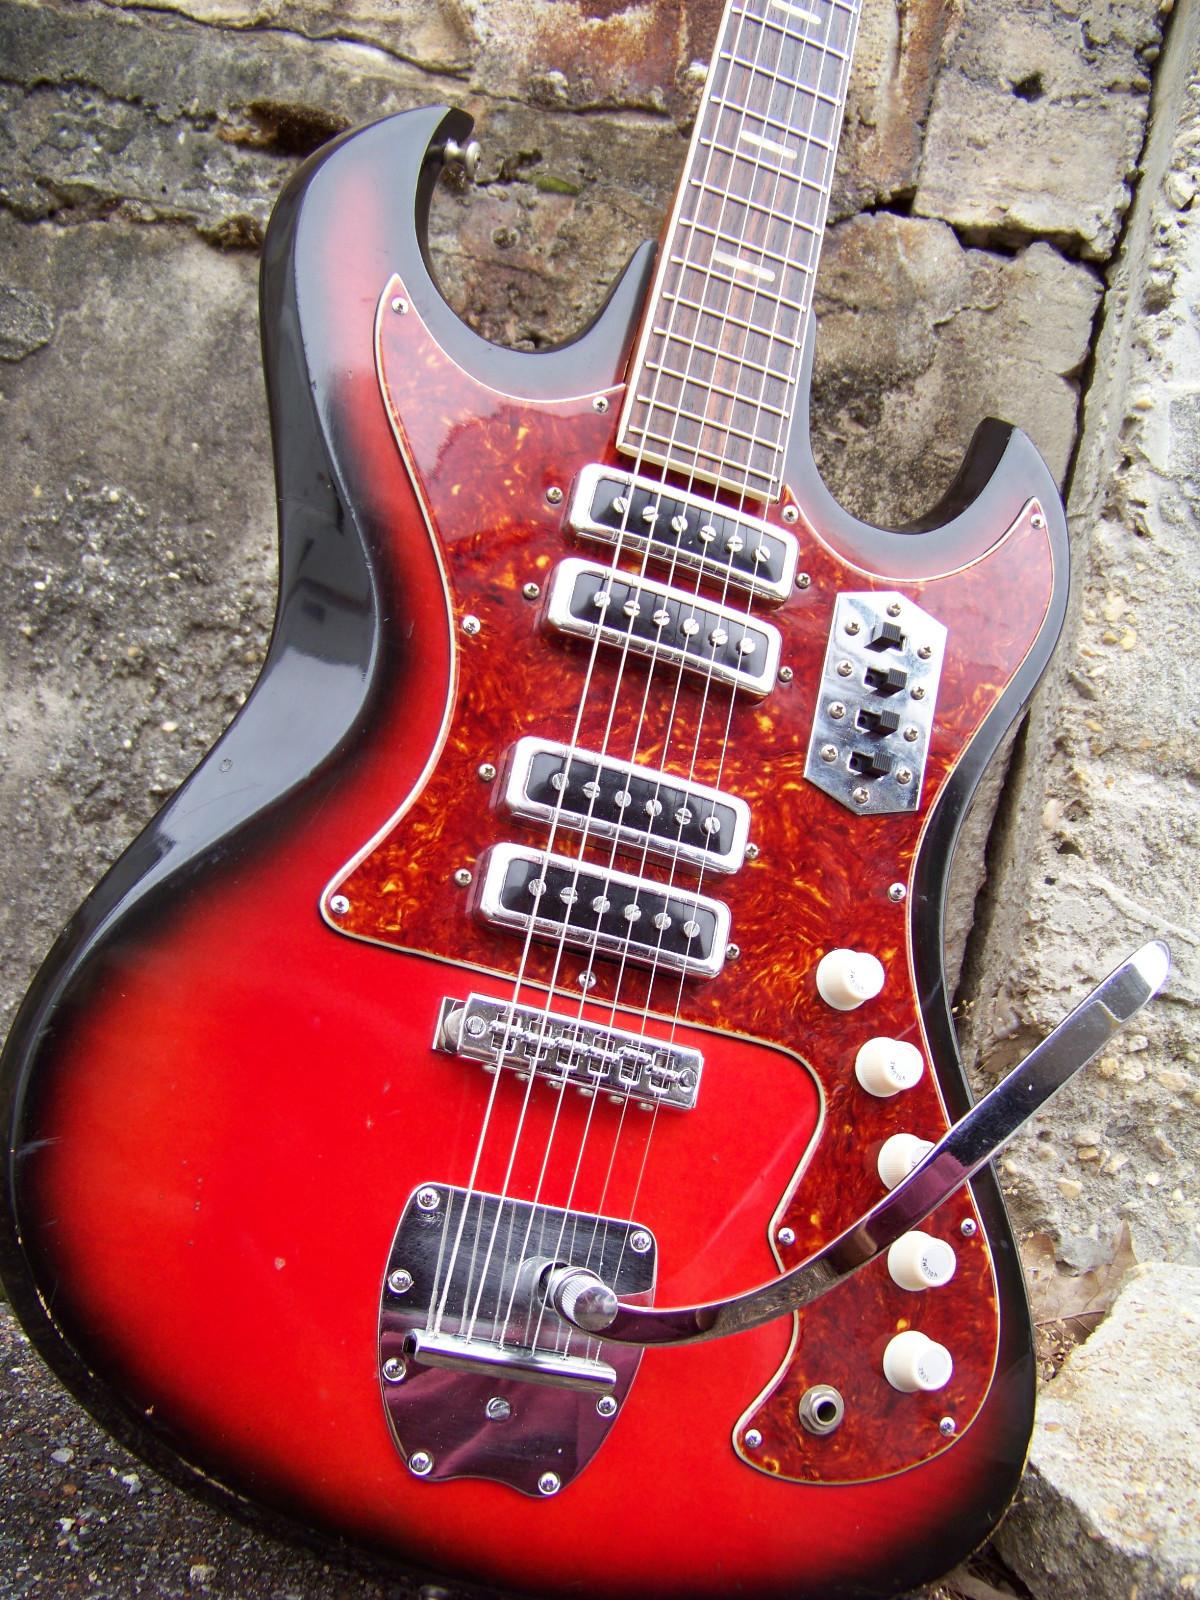 craigslist vintage guitar hunt kawai kingston sd sells for the genuine hound dog taylor kawai teisco electric guitar